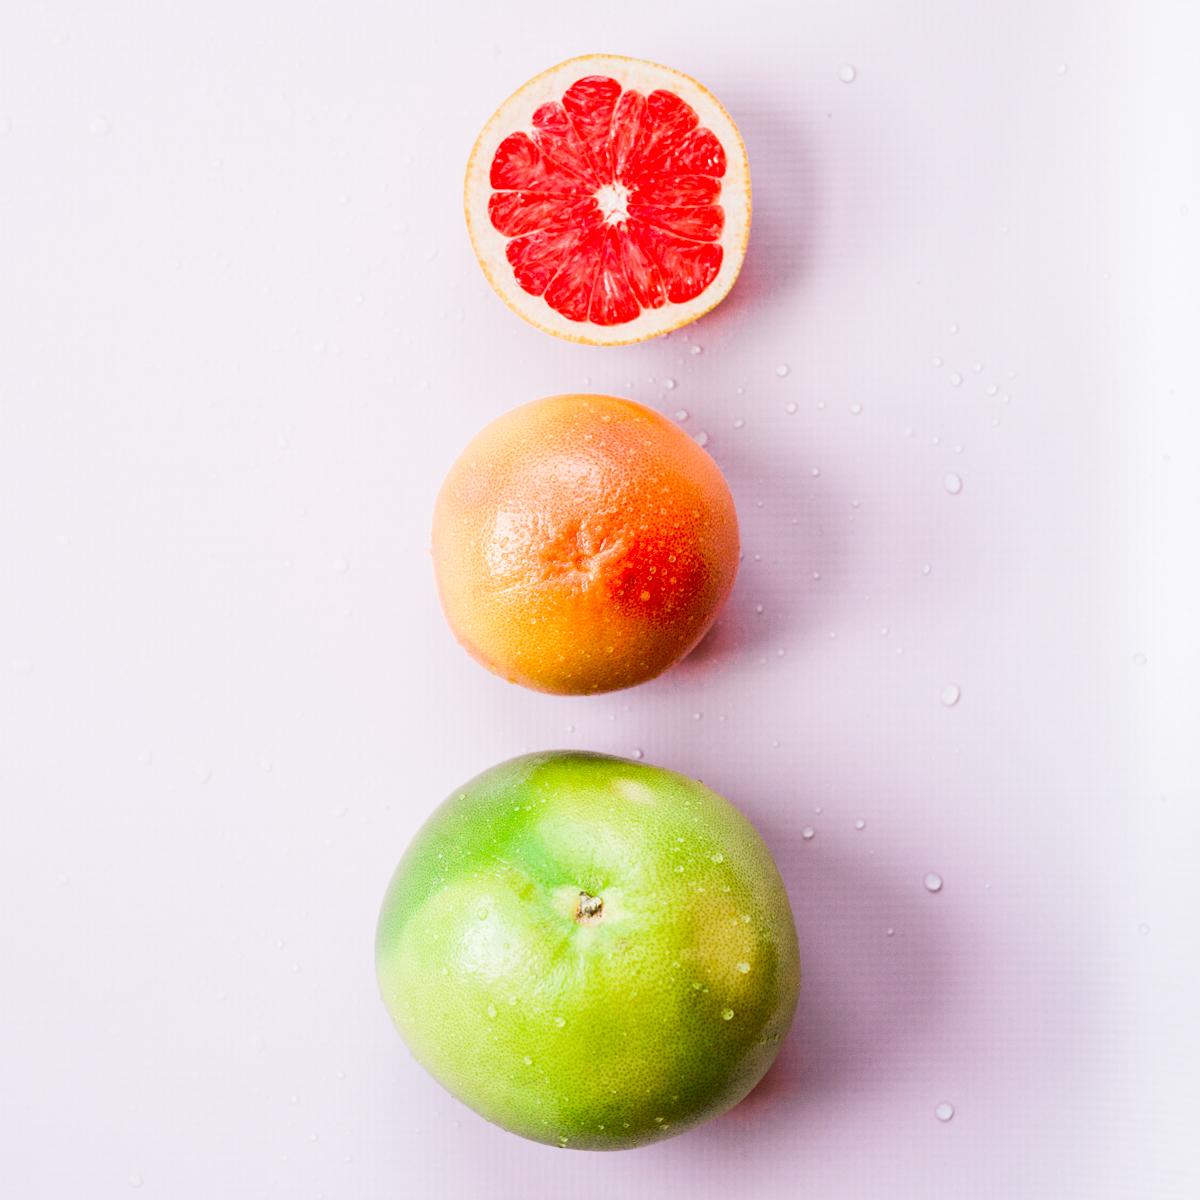 fruits .jpg